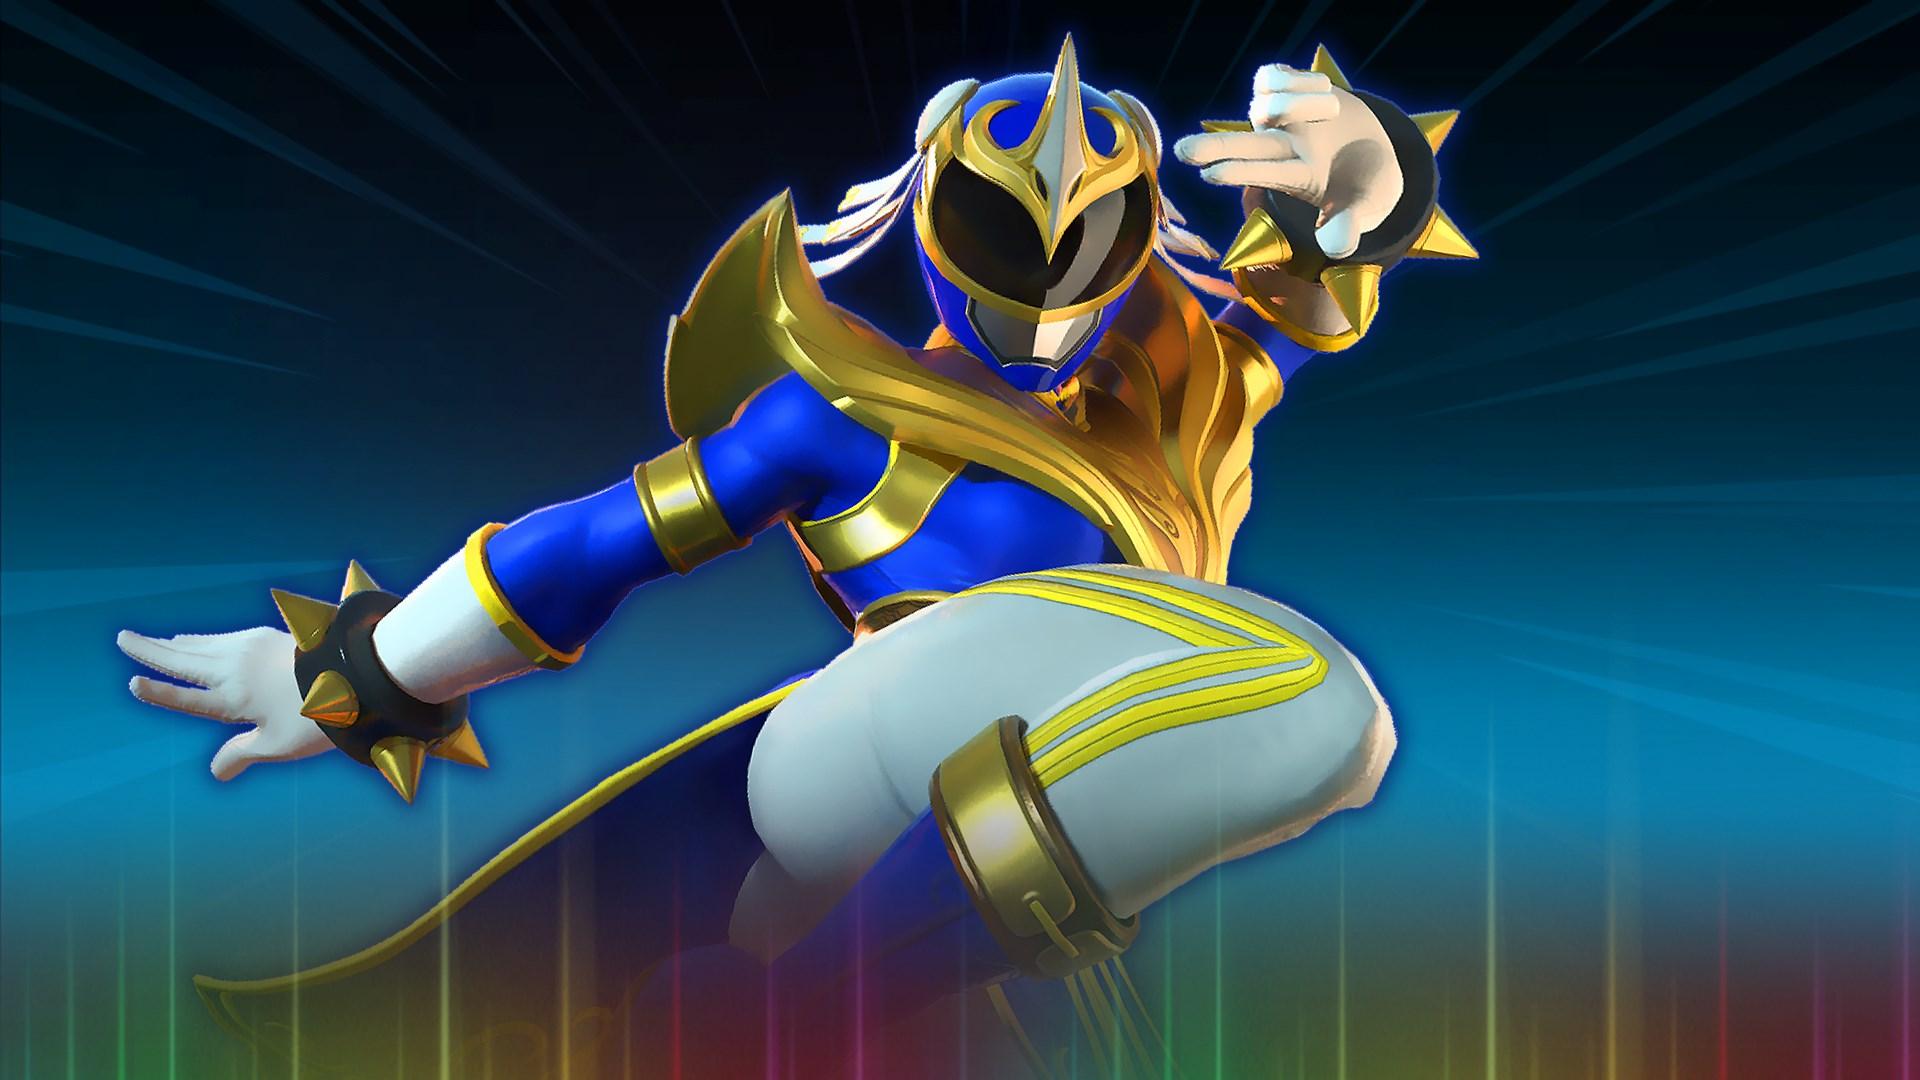 Chun-Li - Blue Phoenix Ranger Character Unlock